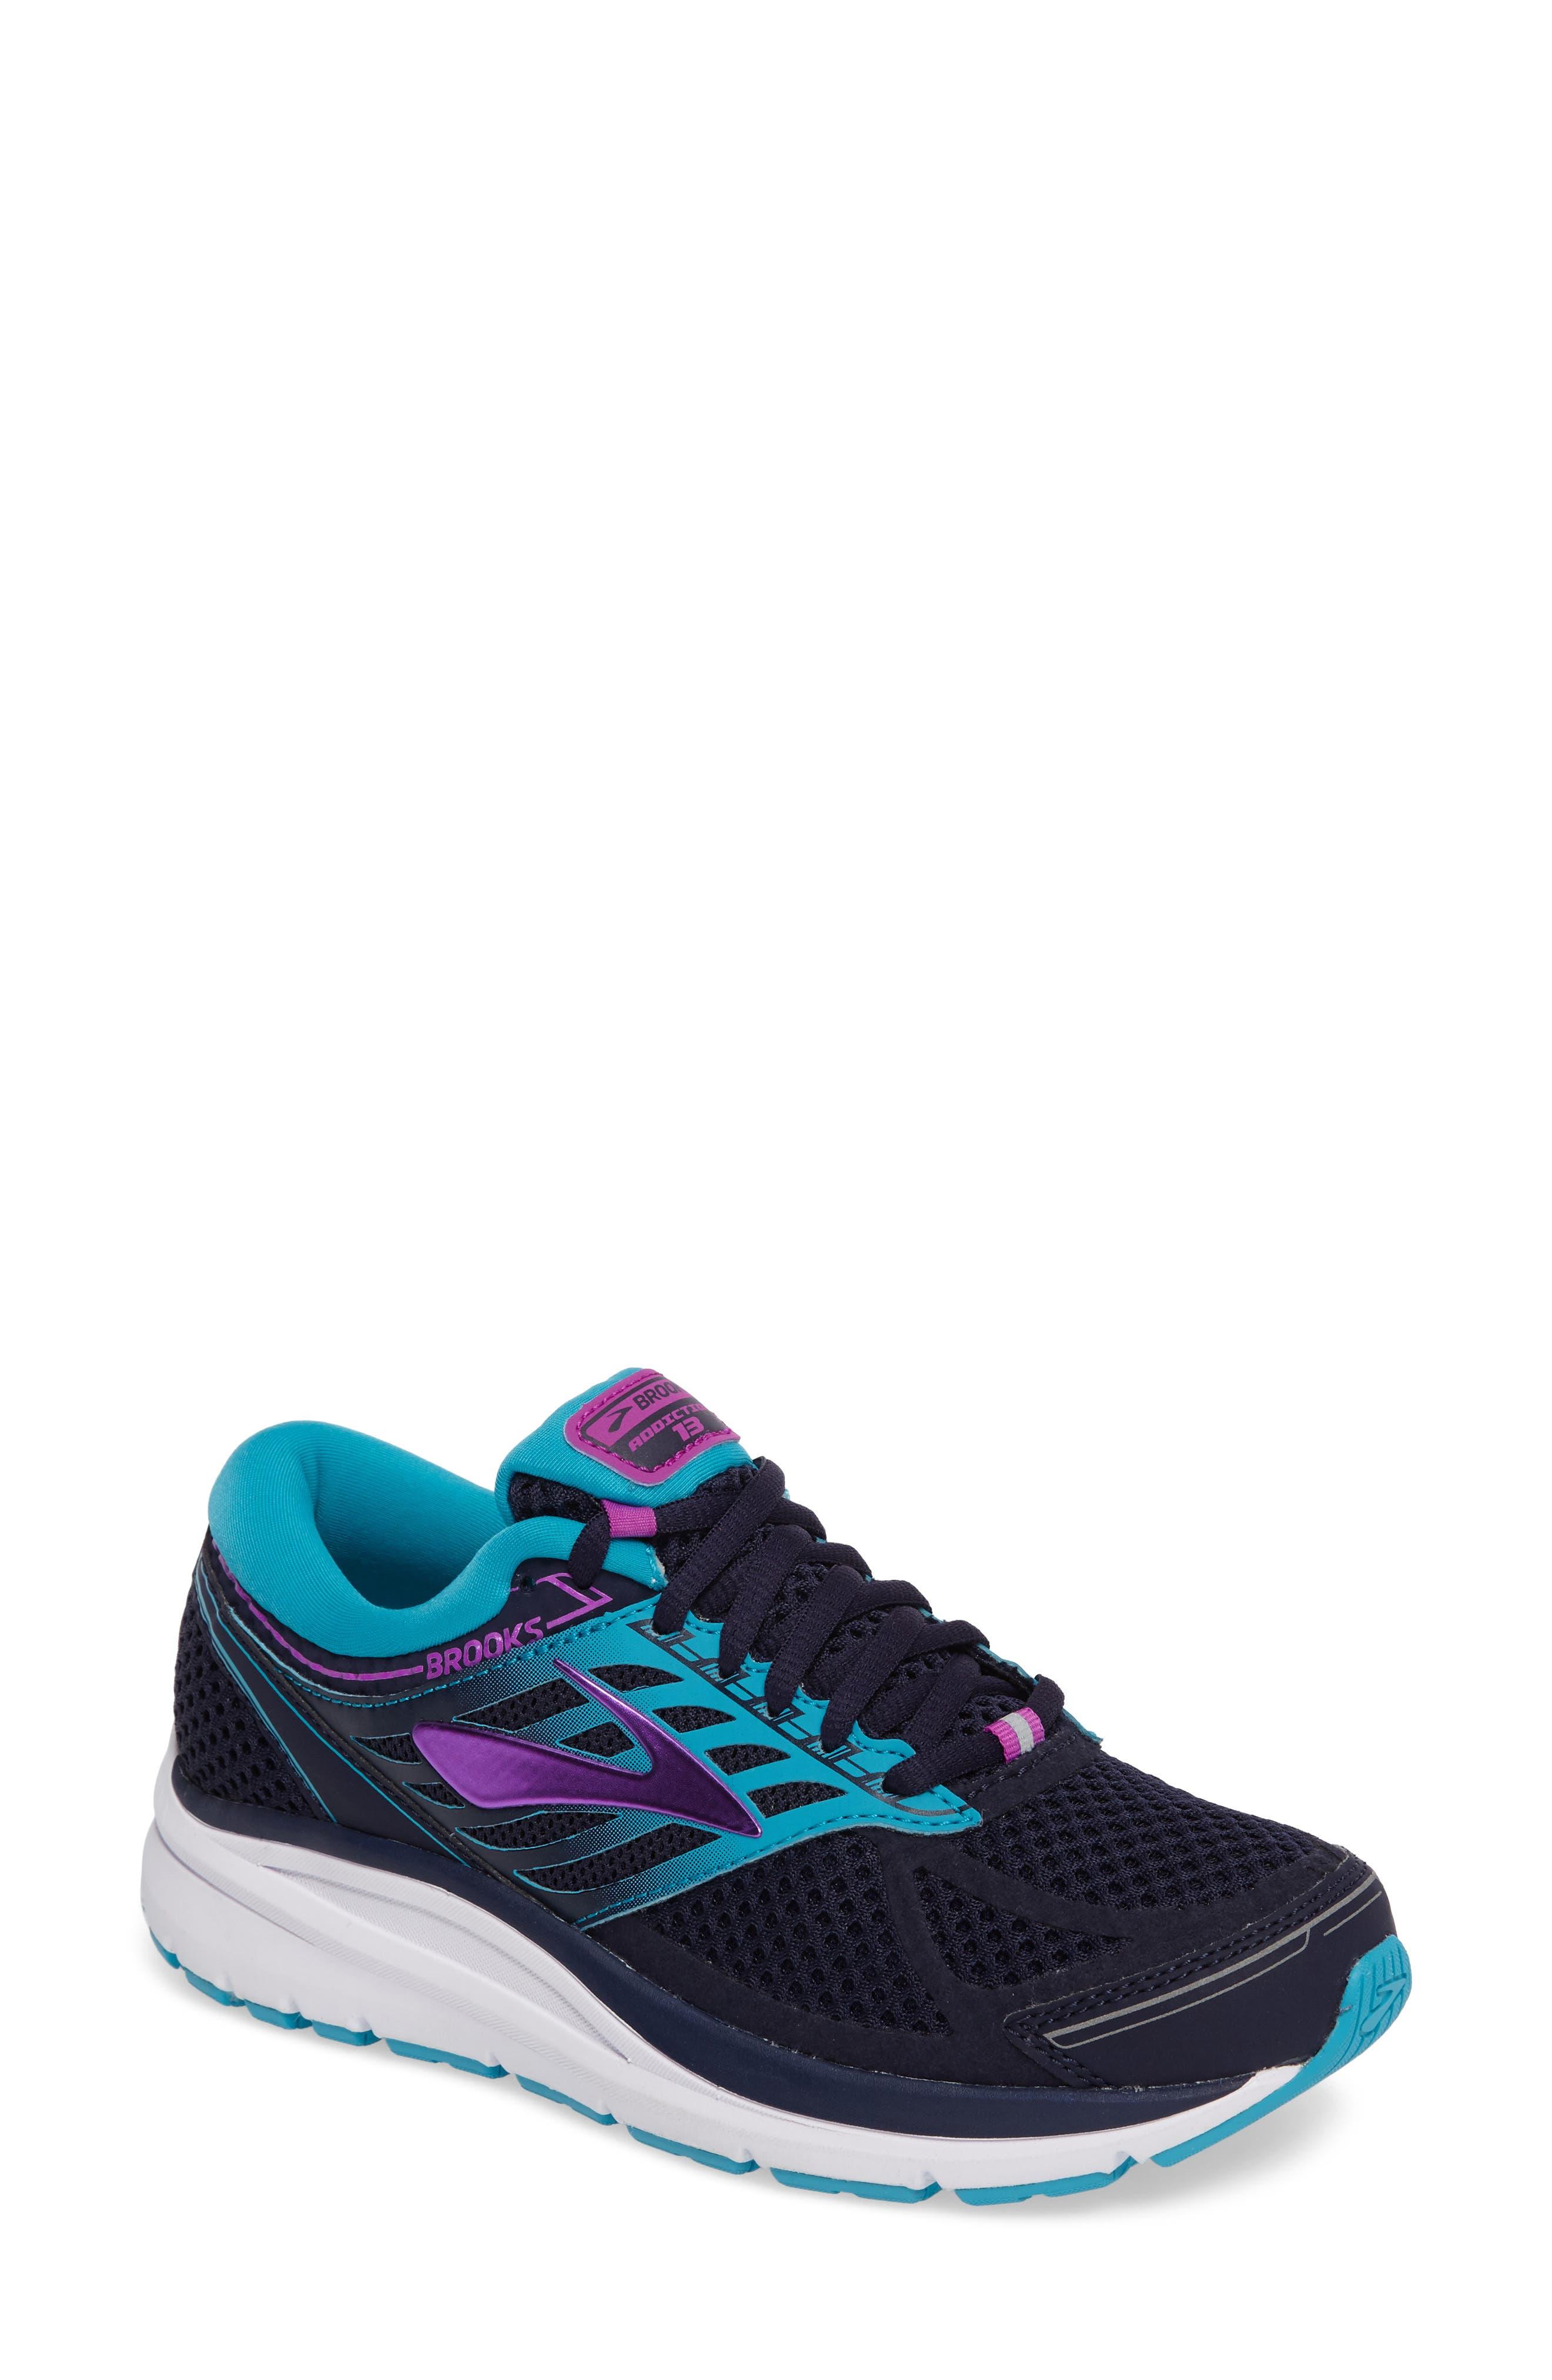 Main Image - Brooks Addiction 13 Running Shoe (Women)